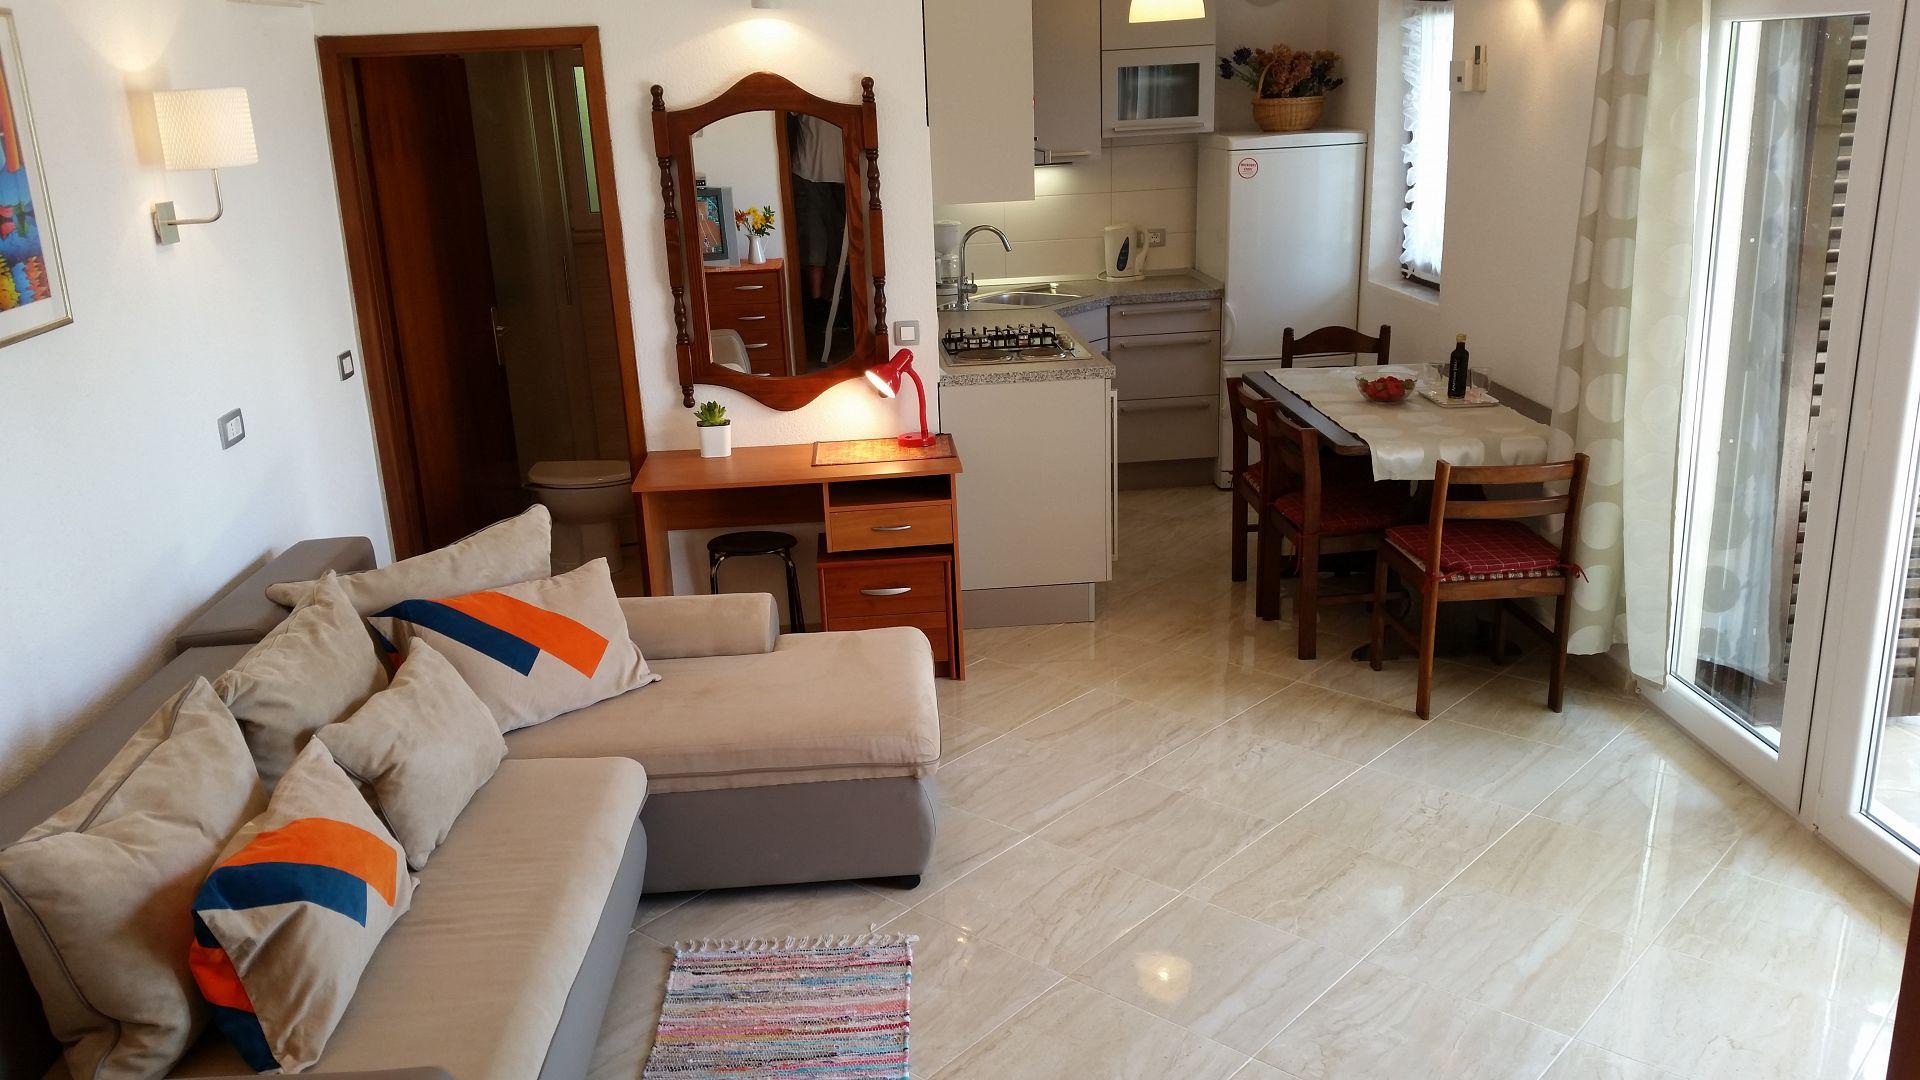 00209PISA  - Pisak - Ferienwohnungen Kroatien - A3 Prizemlje (2+2): Innenausstattung